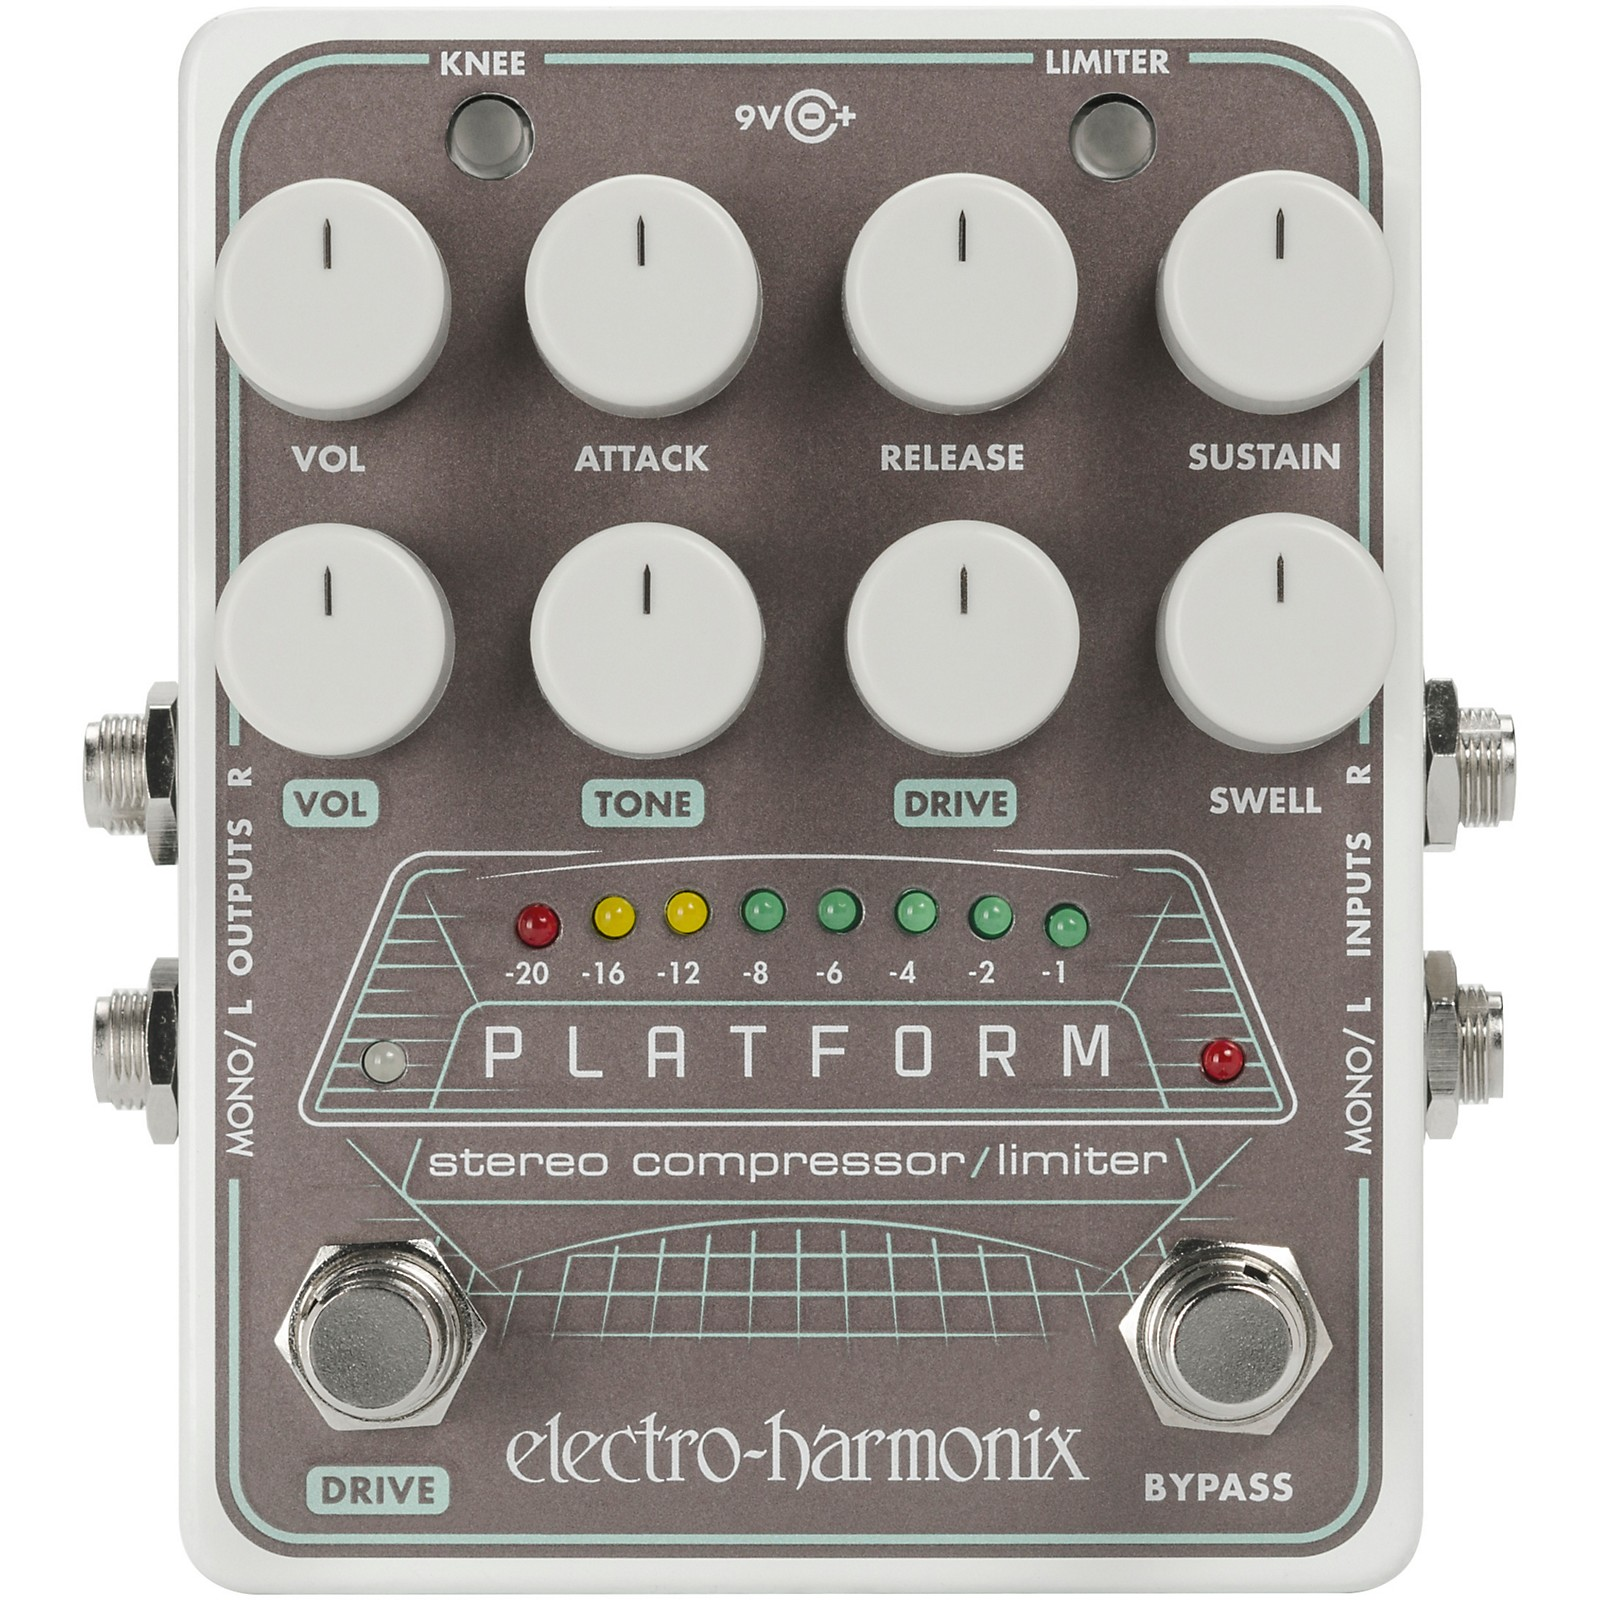 ELECTRO HARMONIX EHX PLATFORM STEREO COMPRESSOR LIMITER POWER SUPPLY ADAPTER 9V